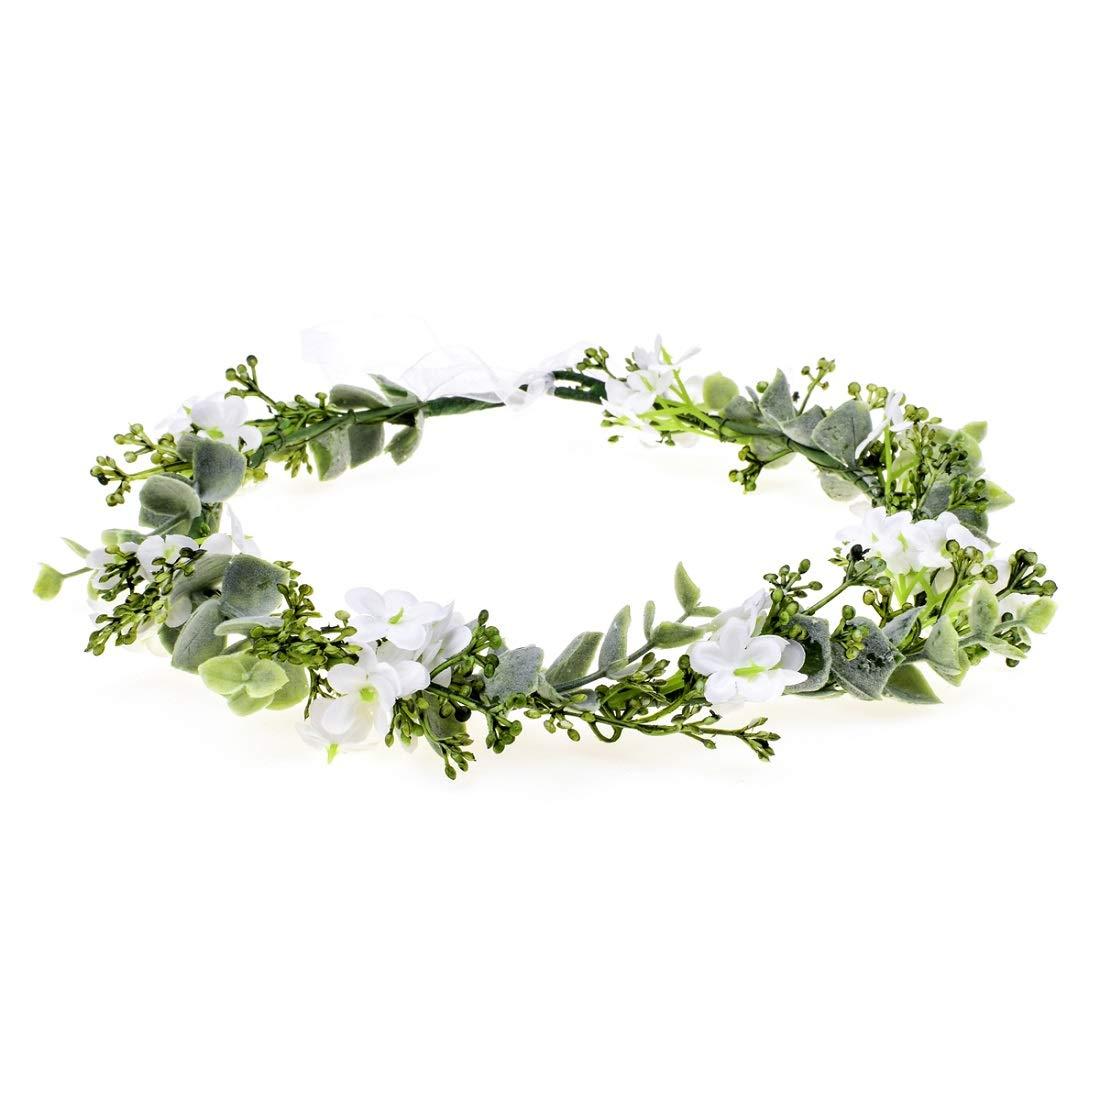 Vividsun Bridal Green Leaf Crown Bohemian Headpiece Floral Headband Photo Prop (white flower) by Vividsun